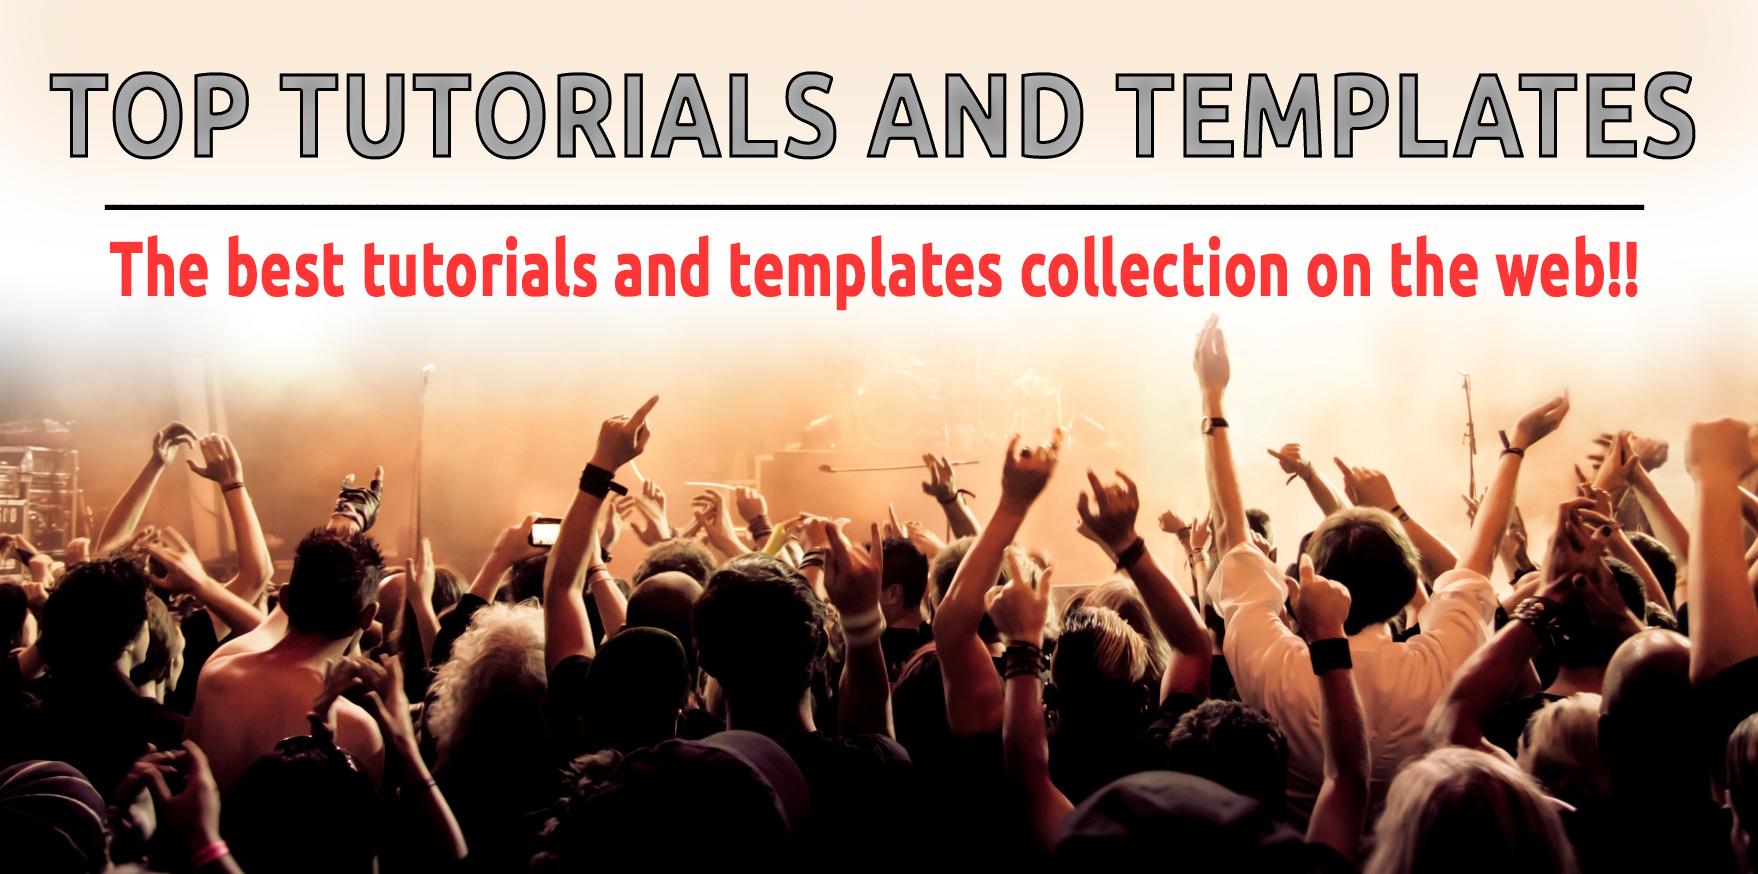 Top Tutorials and Templates